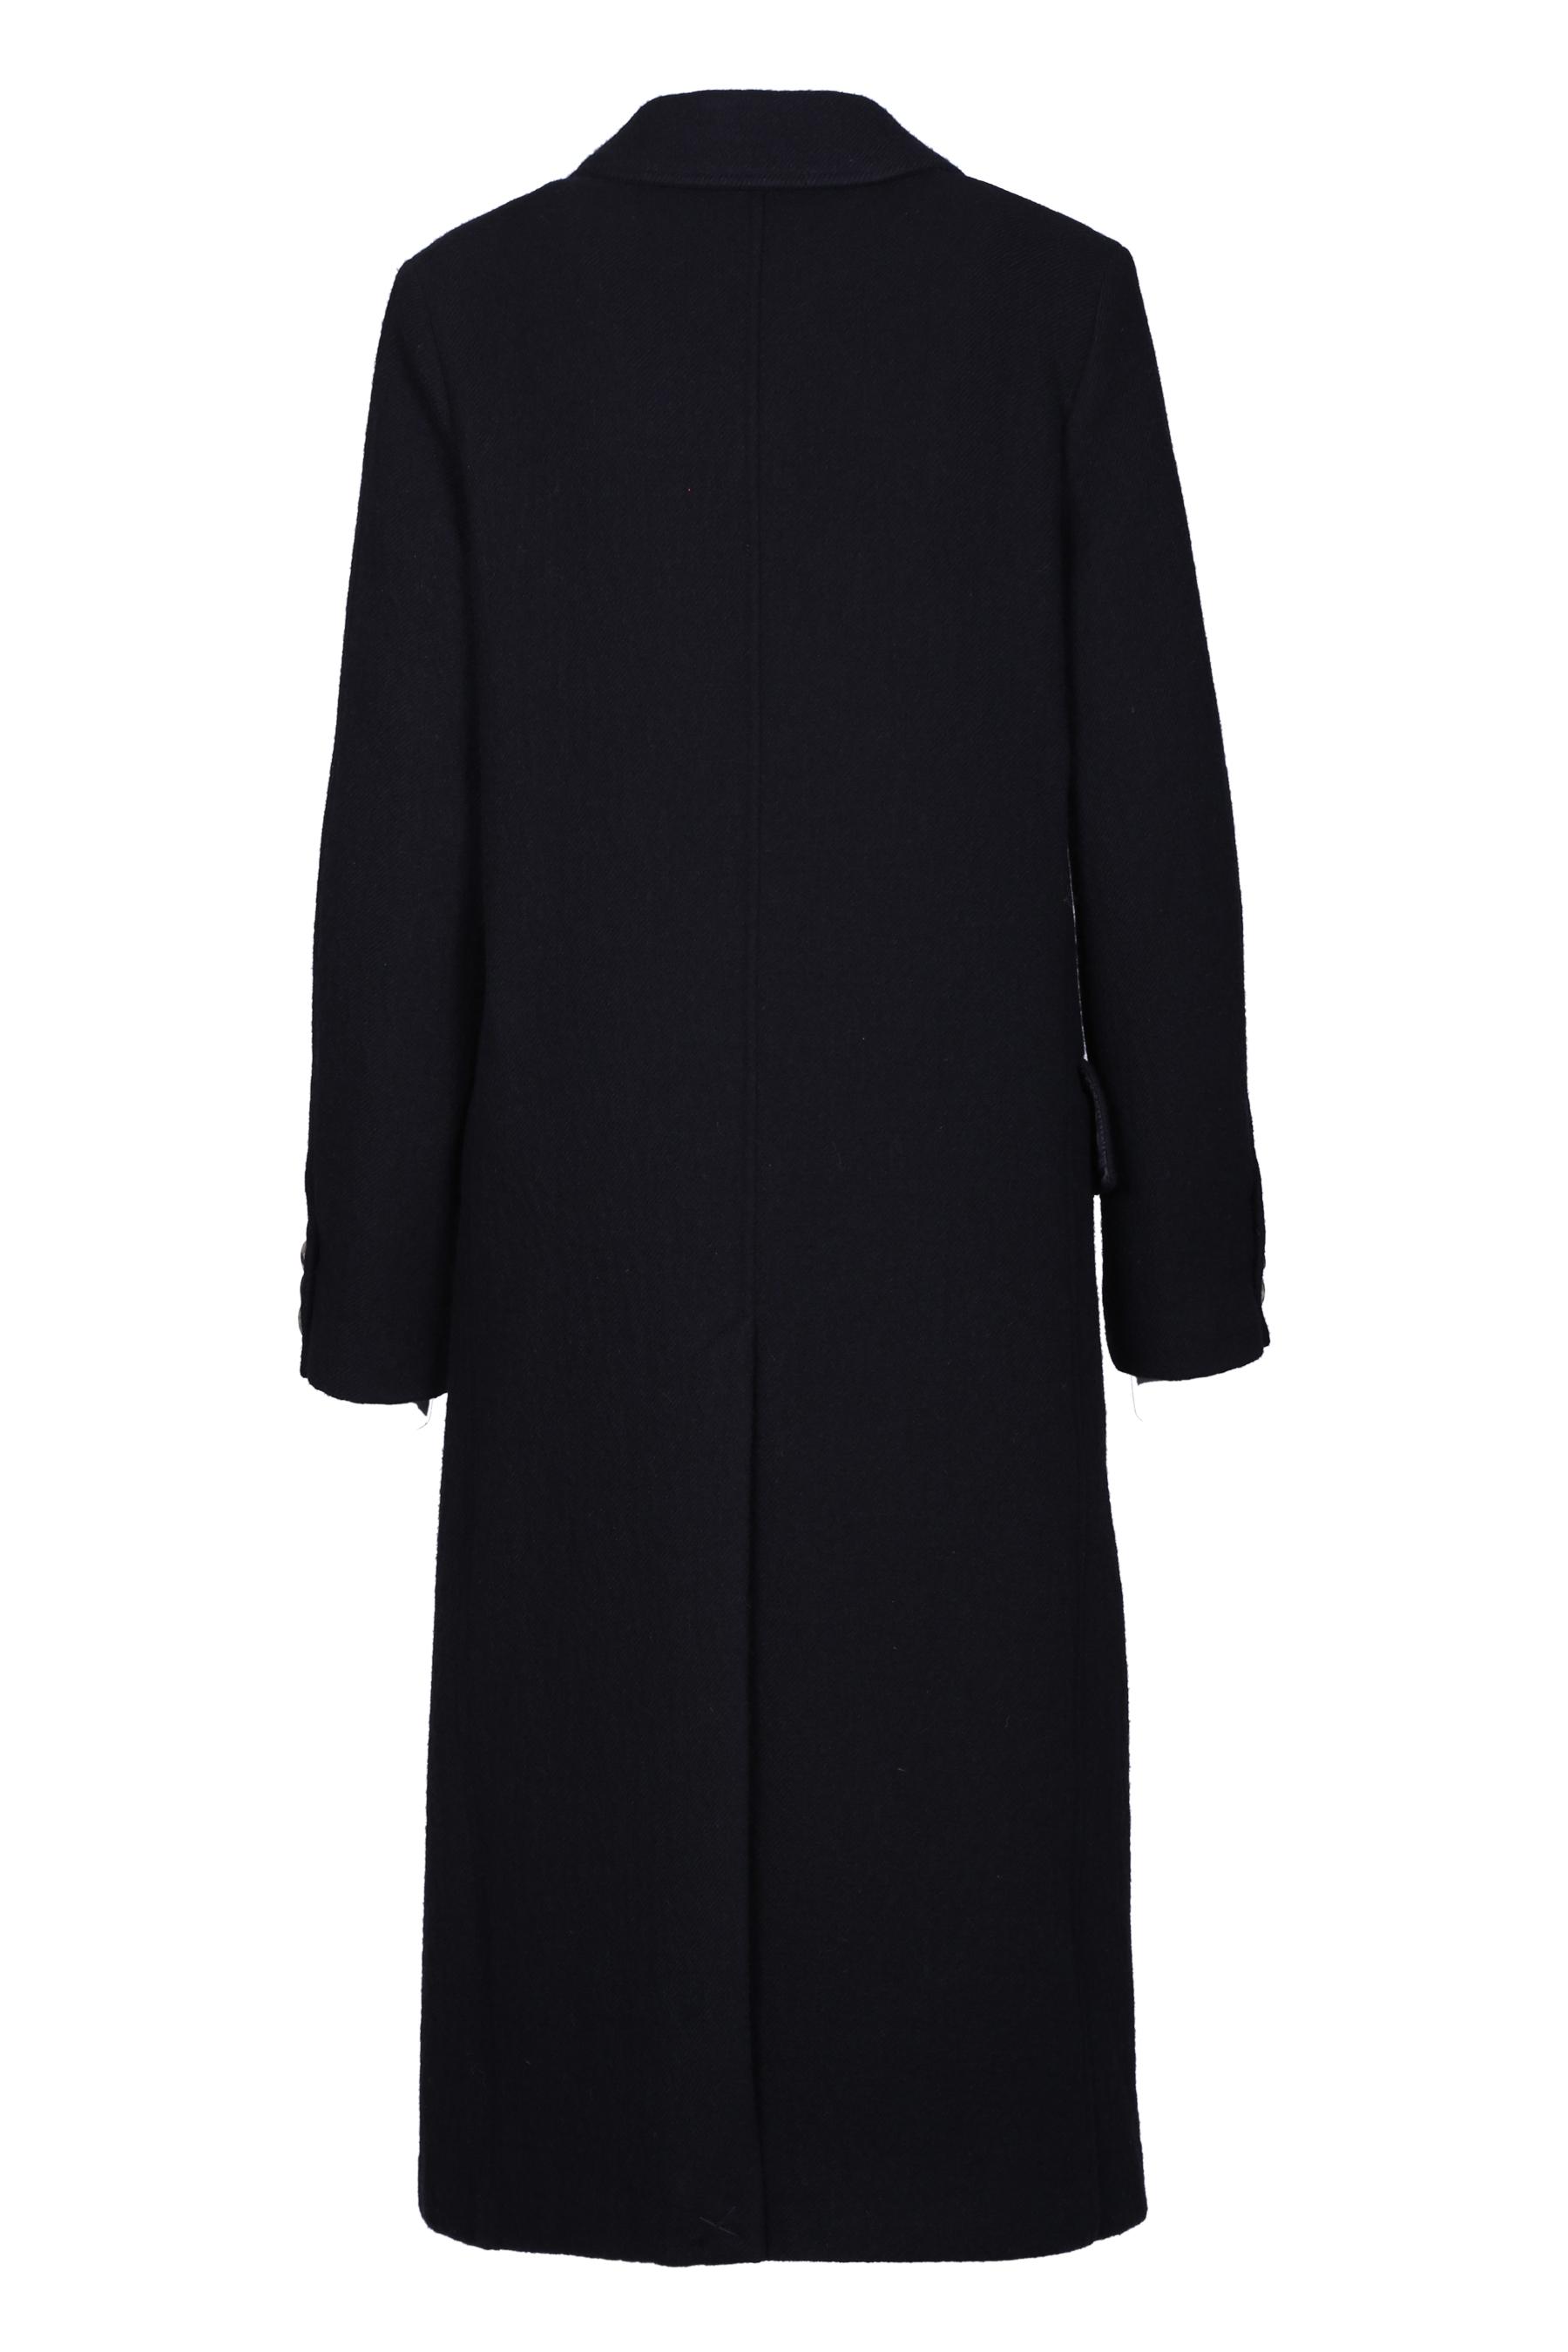 LONG DOUBLE-BREASTED COAT MOMONI | Coat | MOC00060990